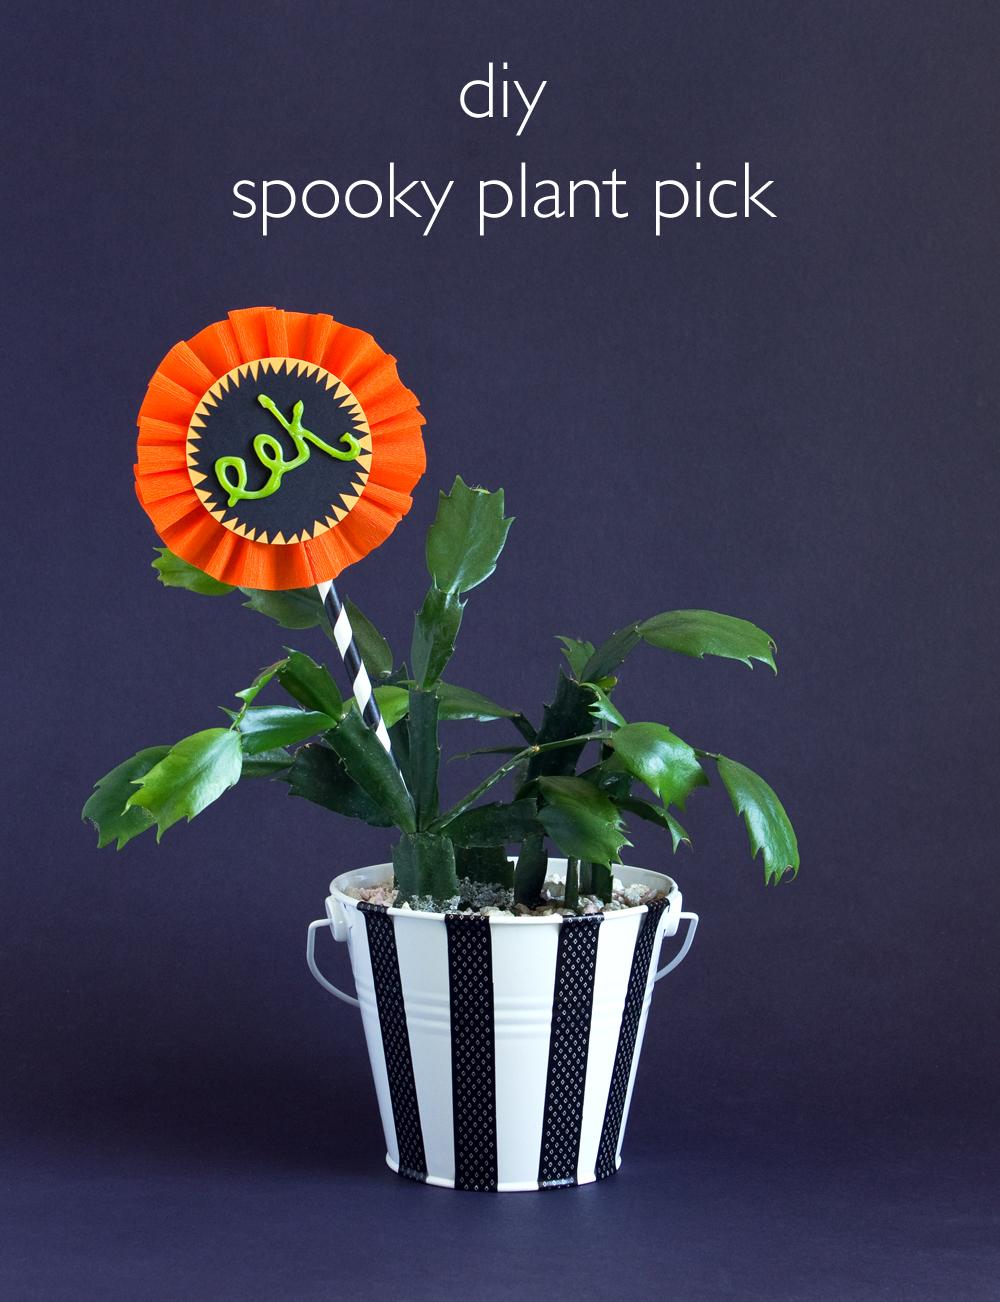 DIY Spooky Plant Pick